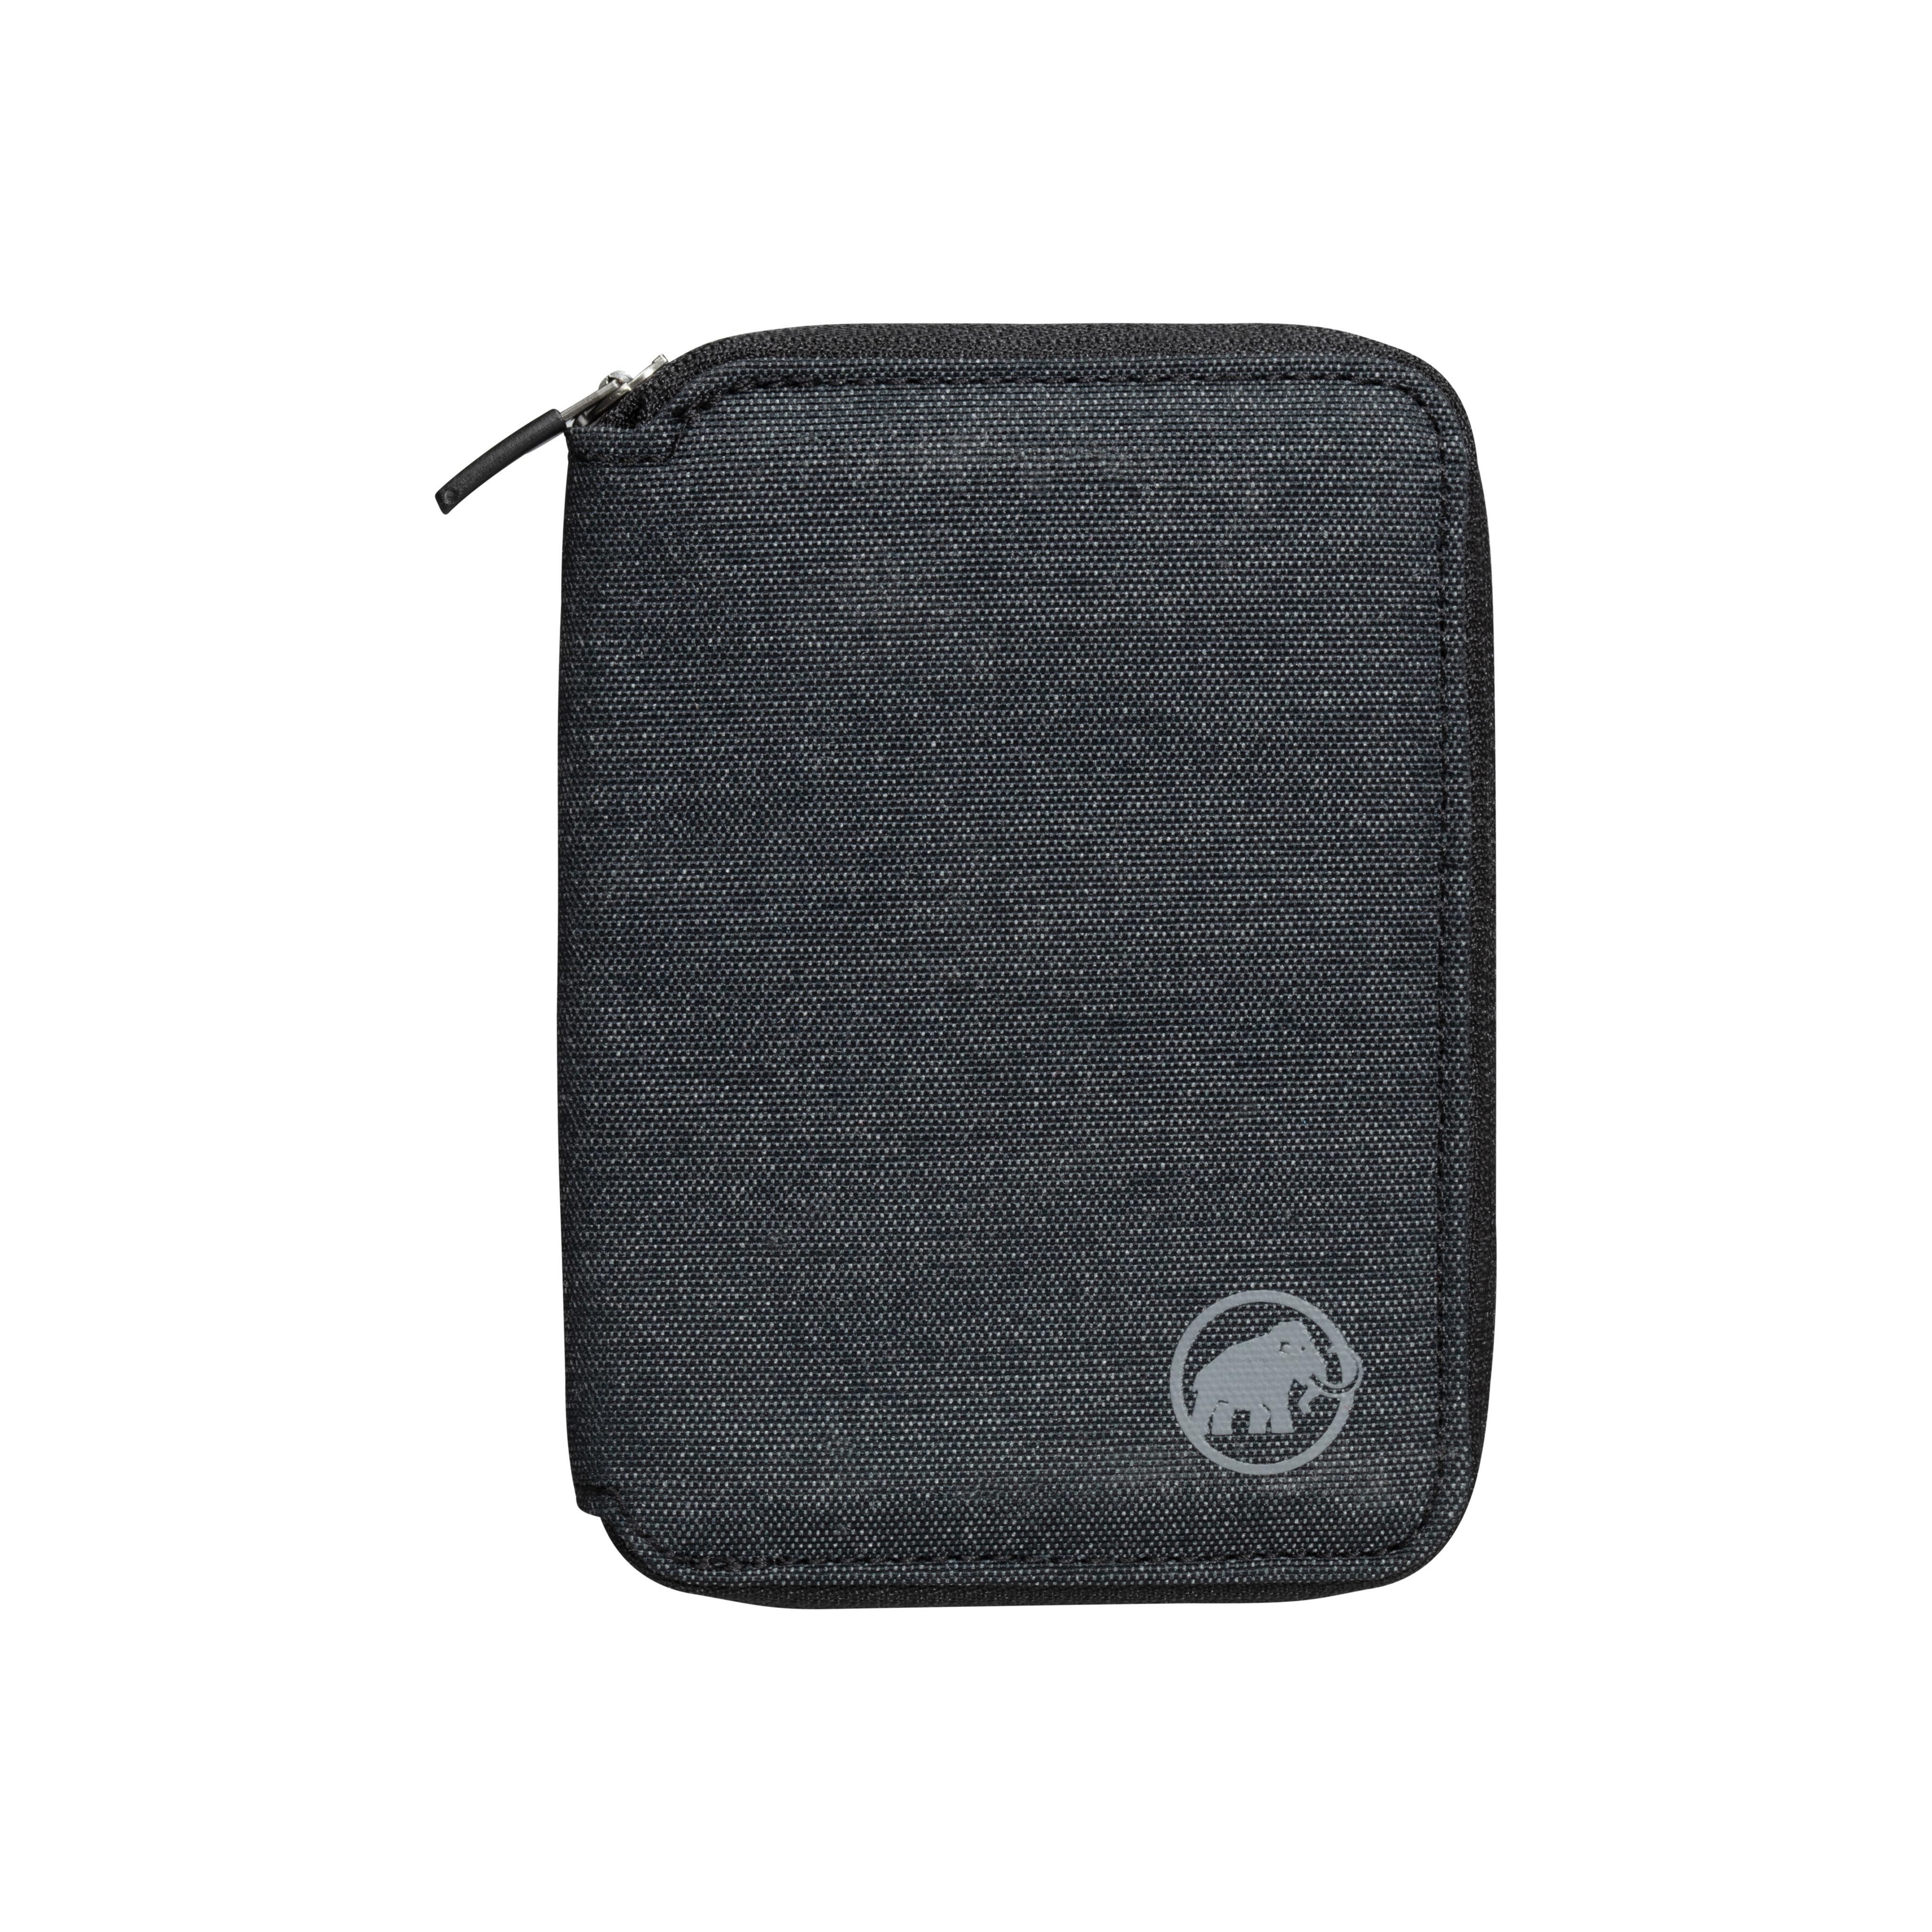 Zip Wallet Mélange - black, one size thumbnail